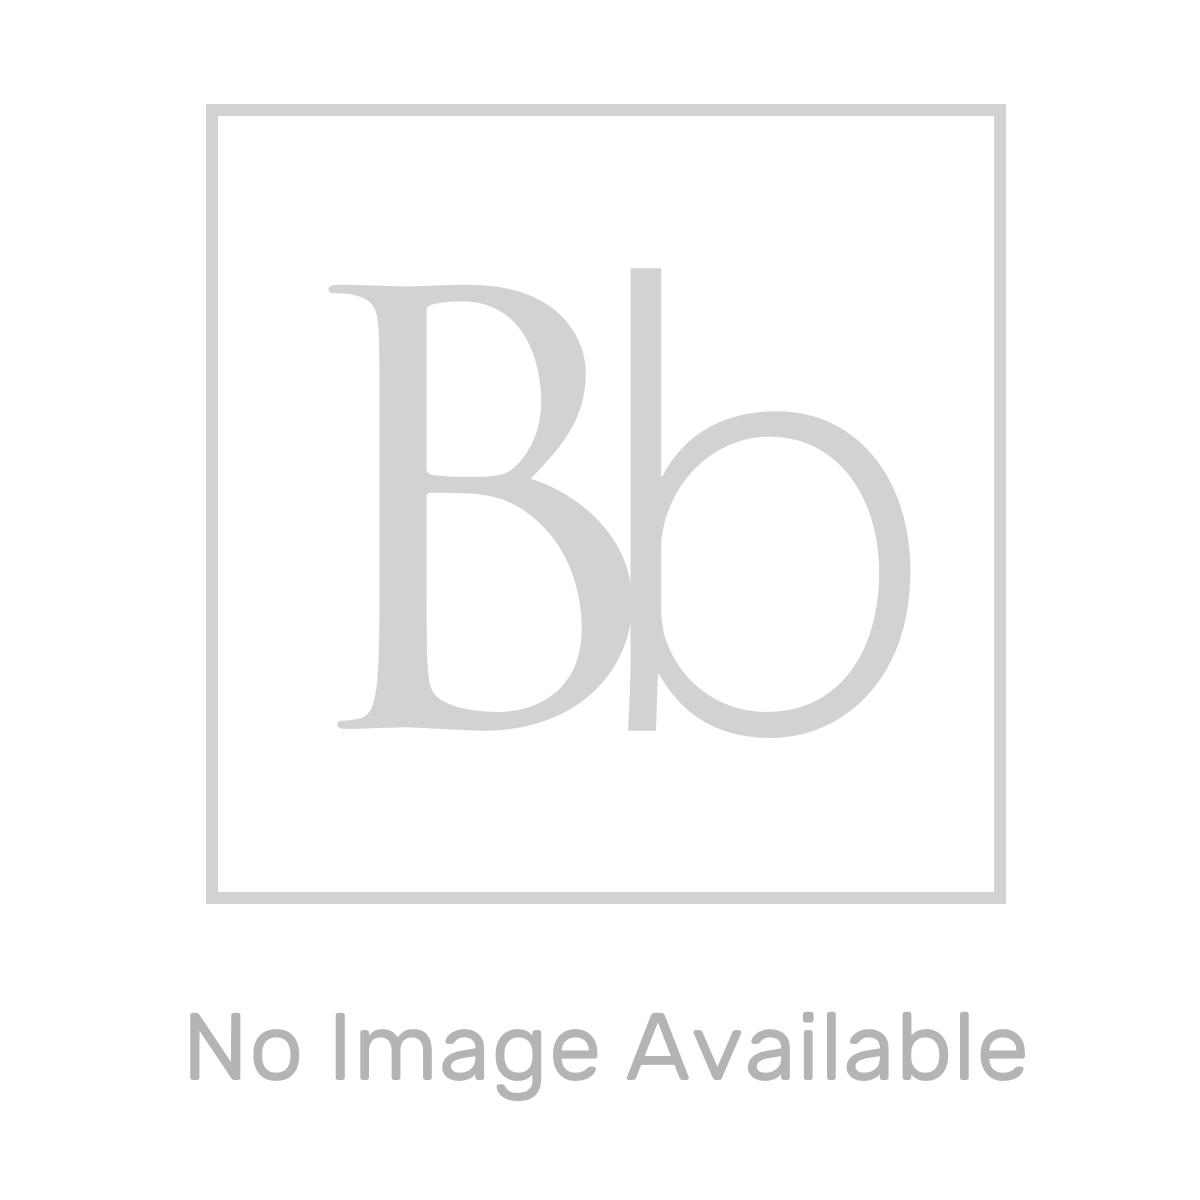 Aquadart Grey Slate Shower Tray 1600 x 800 Overhead